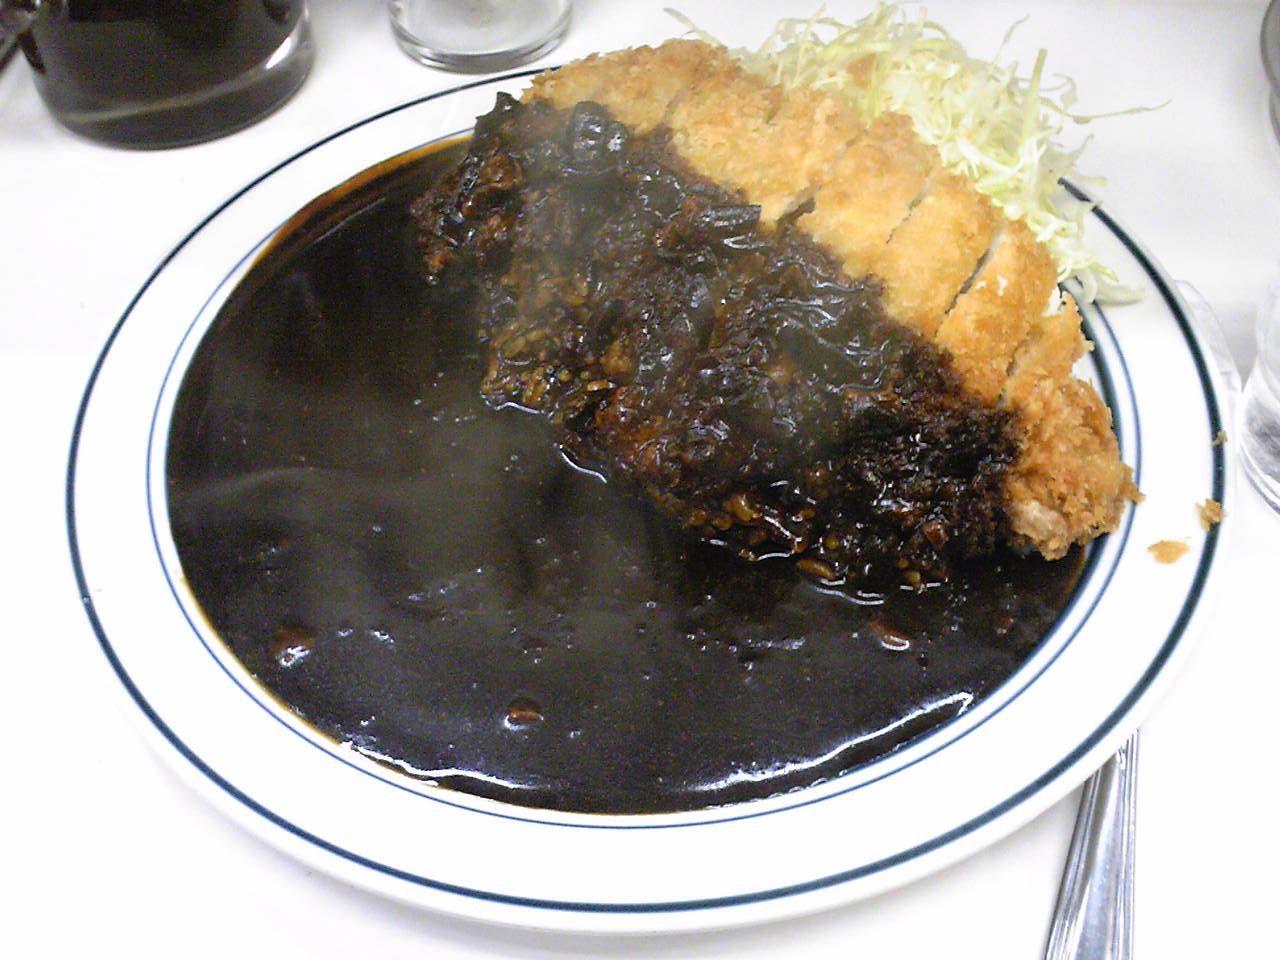 Black Katsu Curry カツカレー 食べ物のアイデア カレー